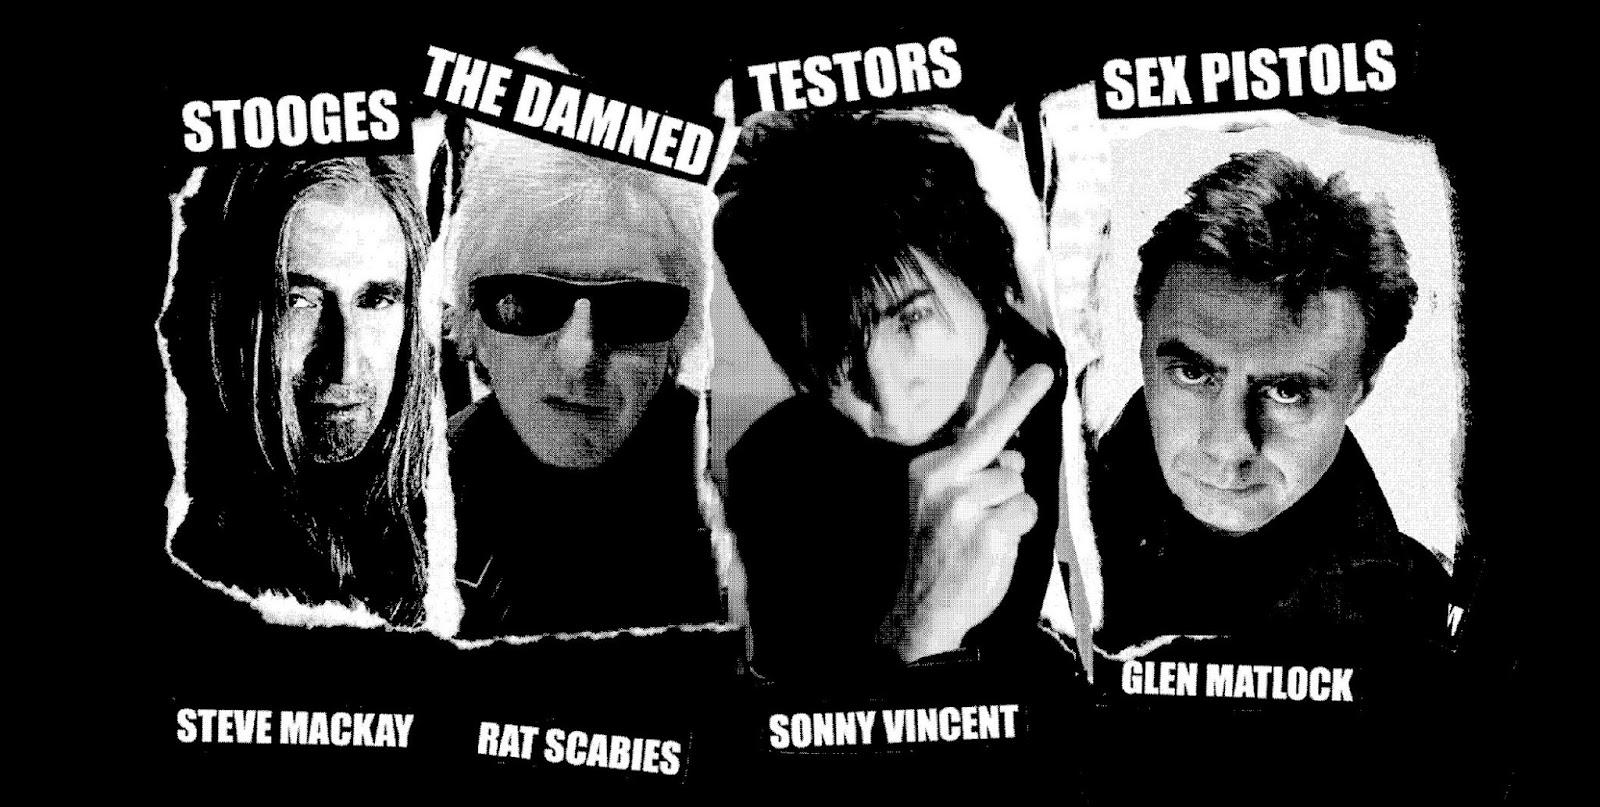 http://www.angelfire.com/ny/punkrocknroll/spiteful/